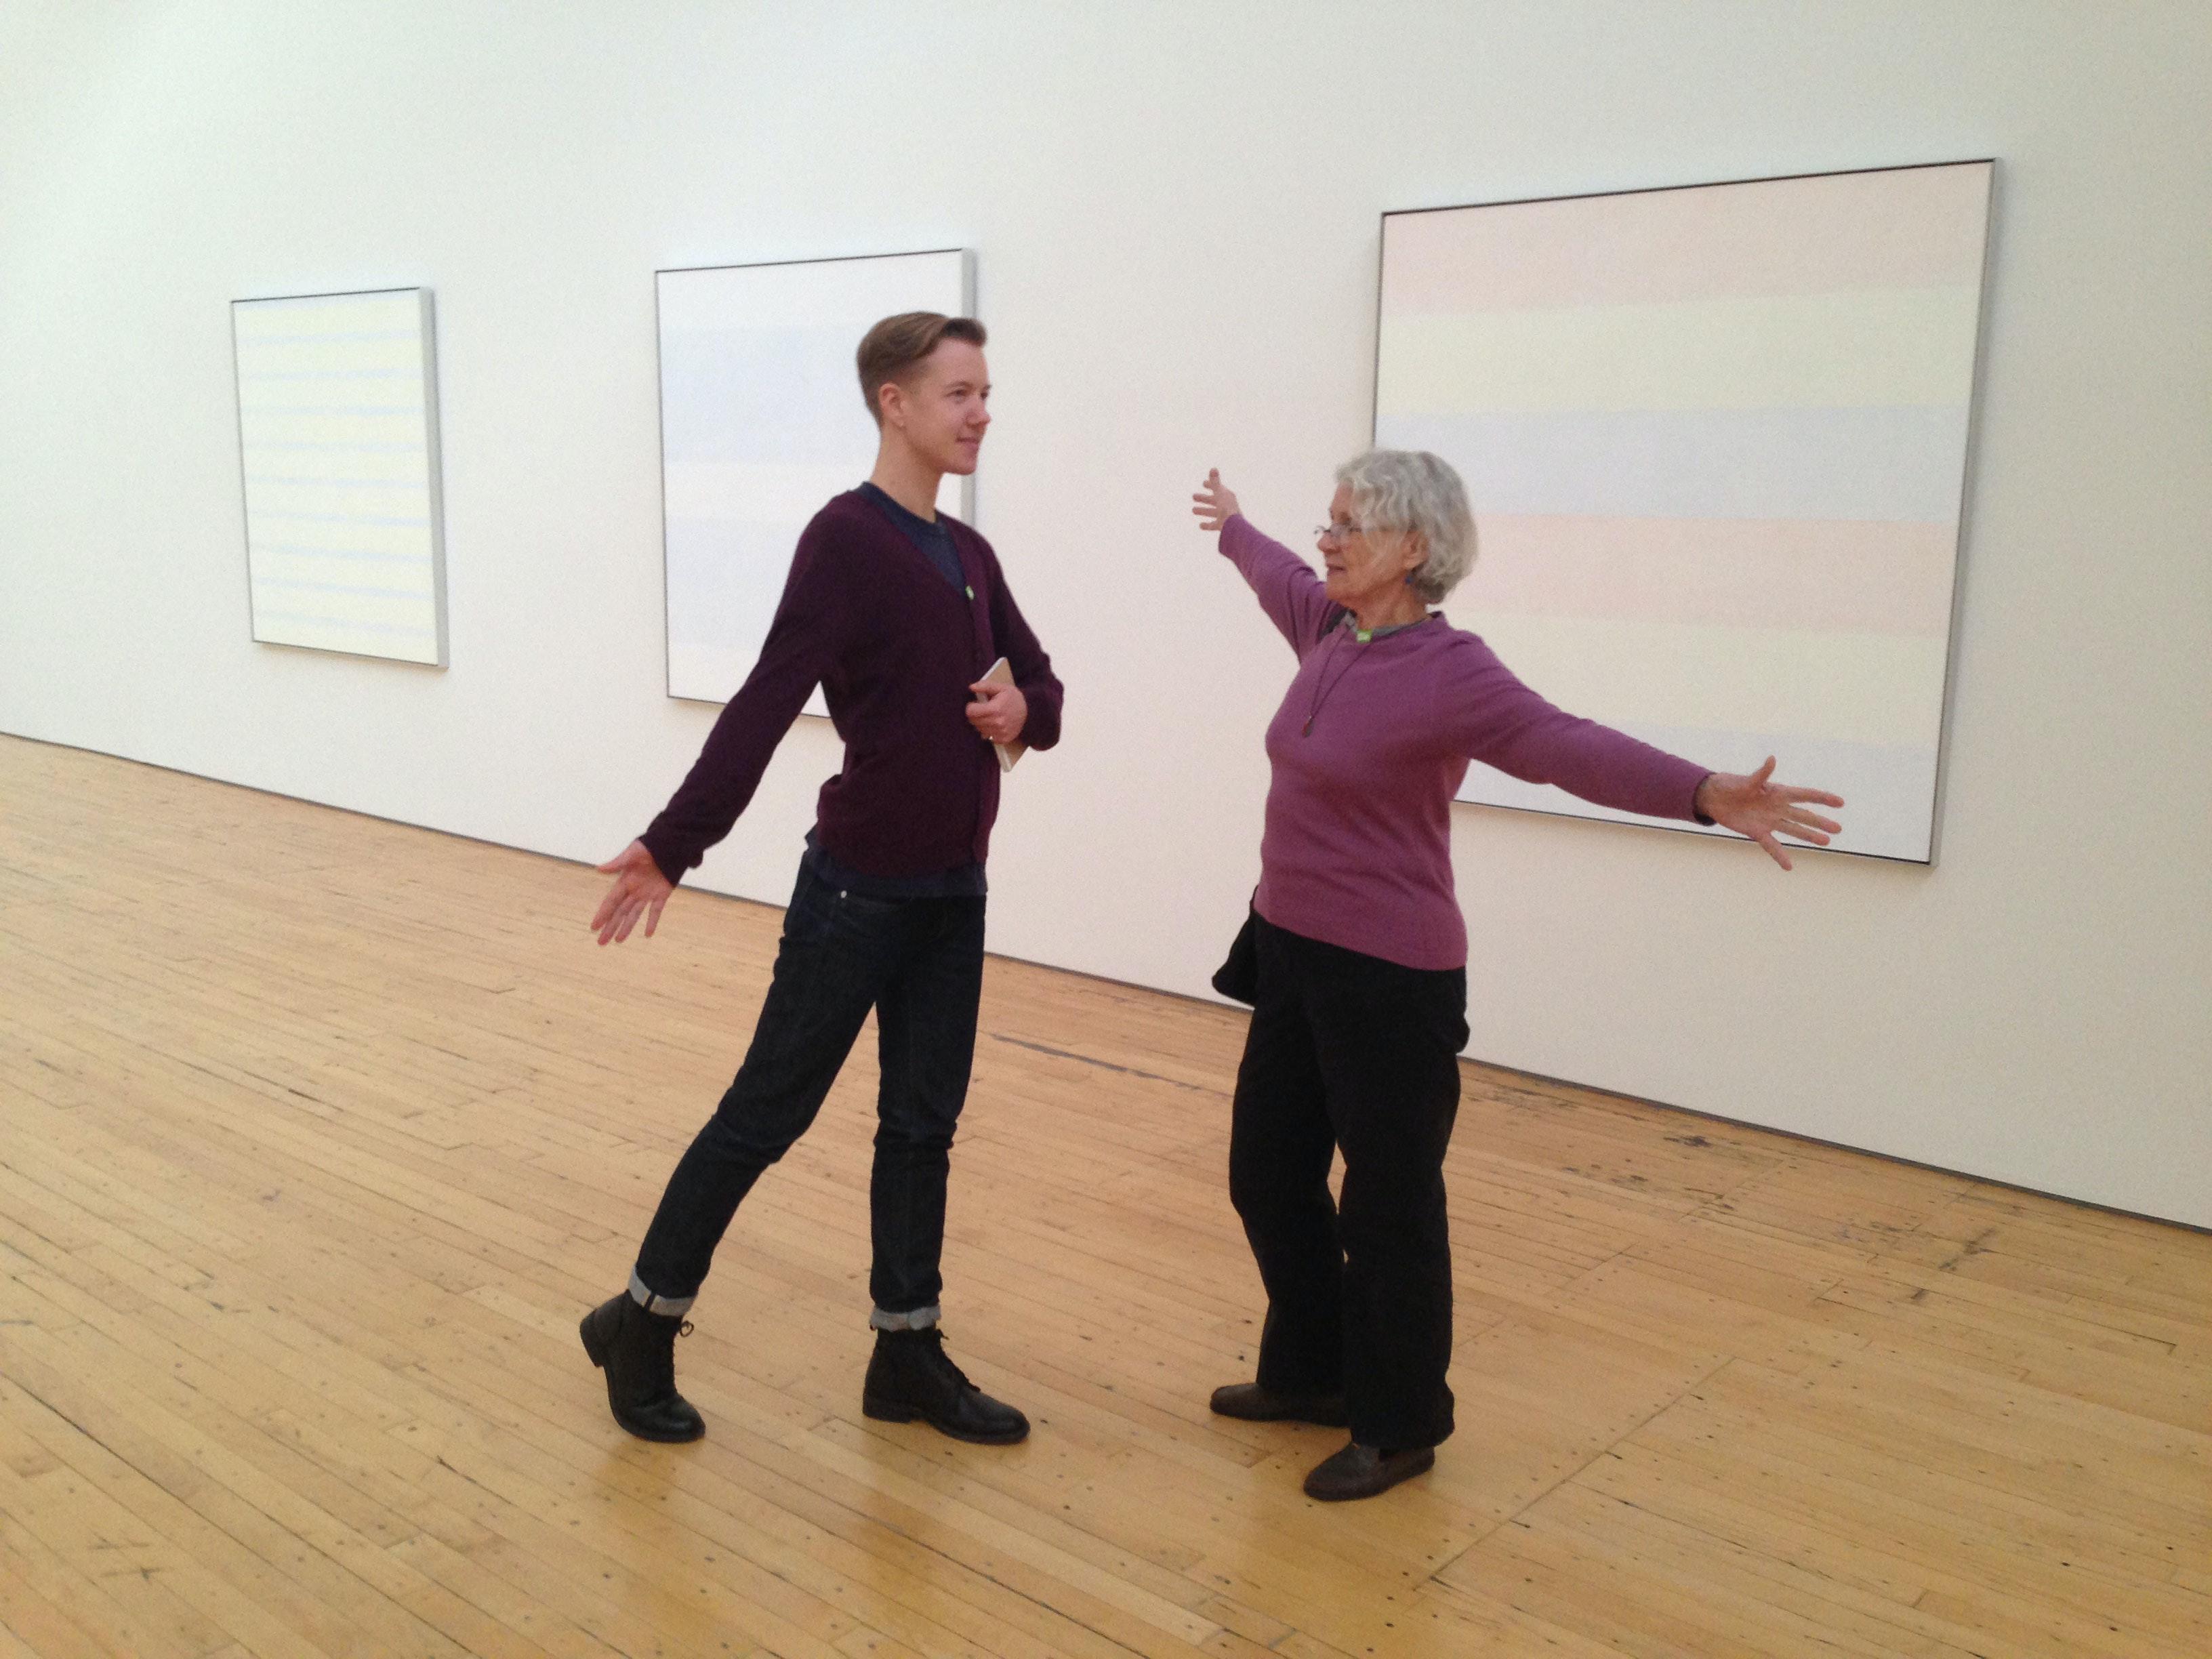 Jean Valentine and the author feeling into Agnes Martin, November 8, 2013 at Dia:Beacon. Photo: Timothy Dorsey.